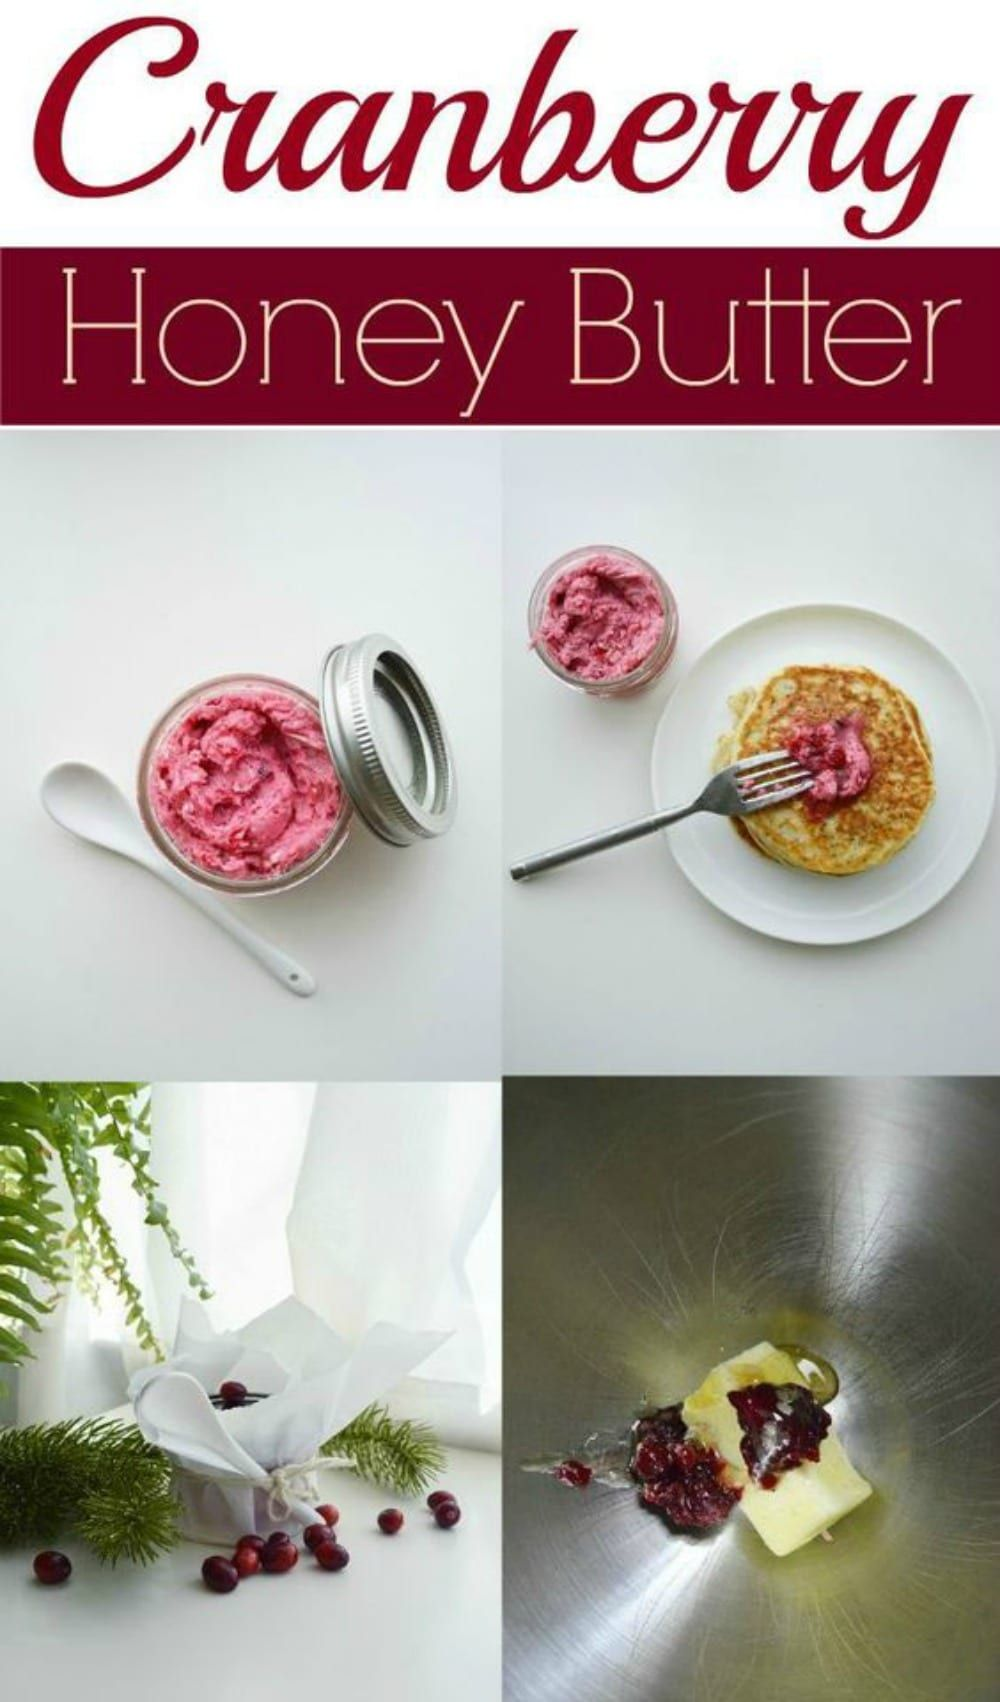 Cranberry Honey Butter Recipe Hostess Gift Divine Lifestyle